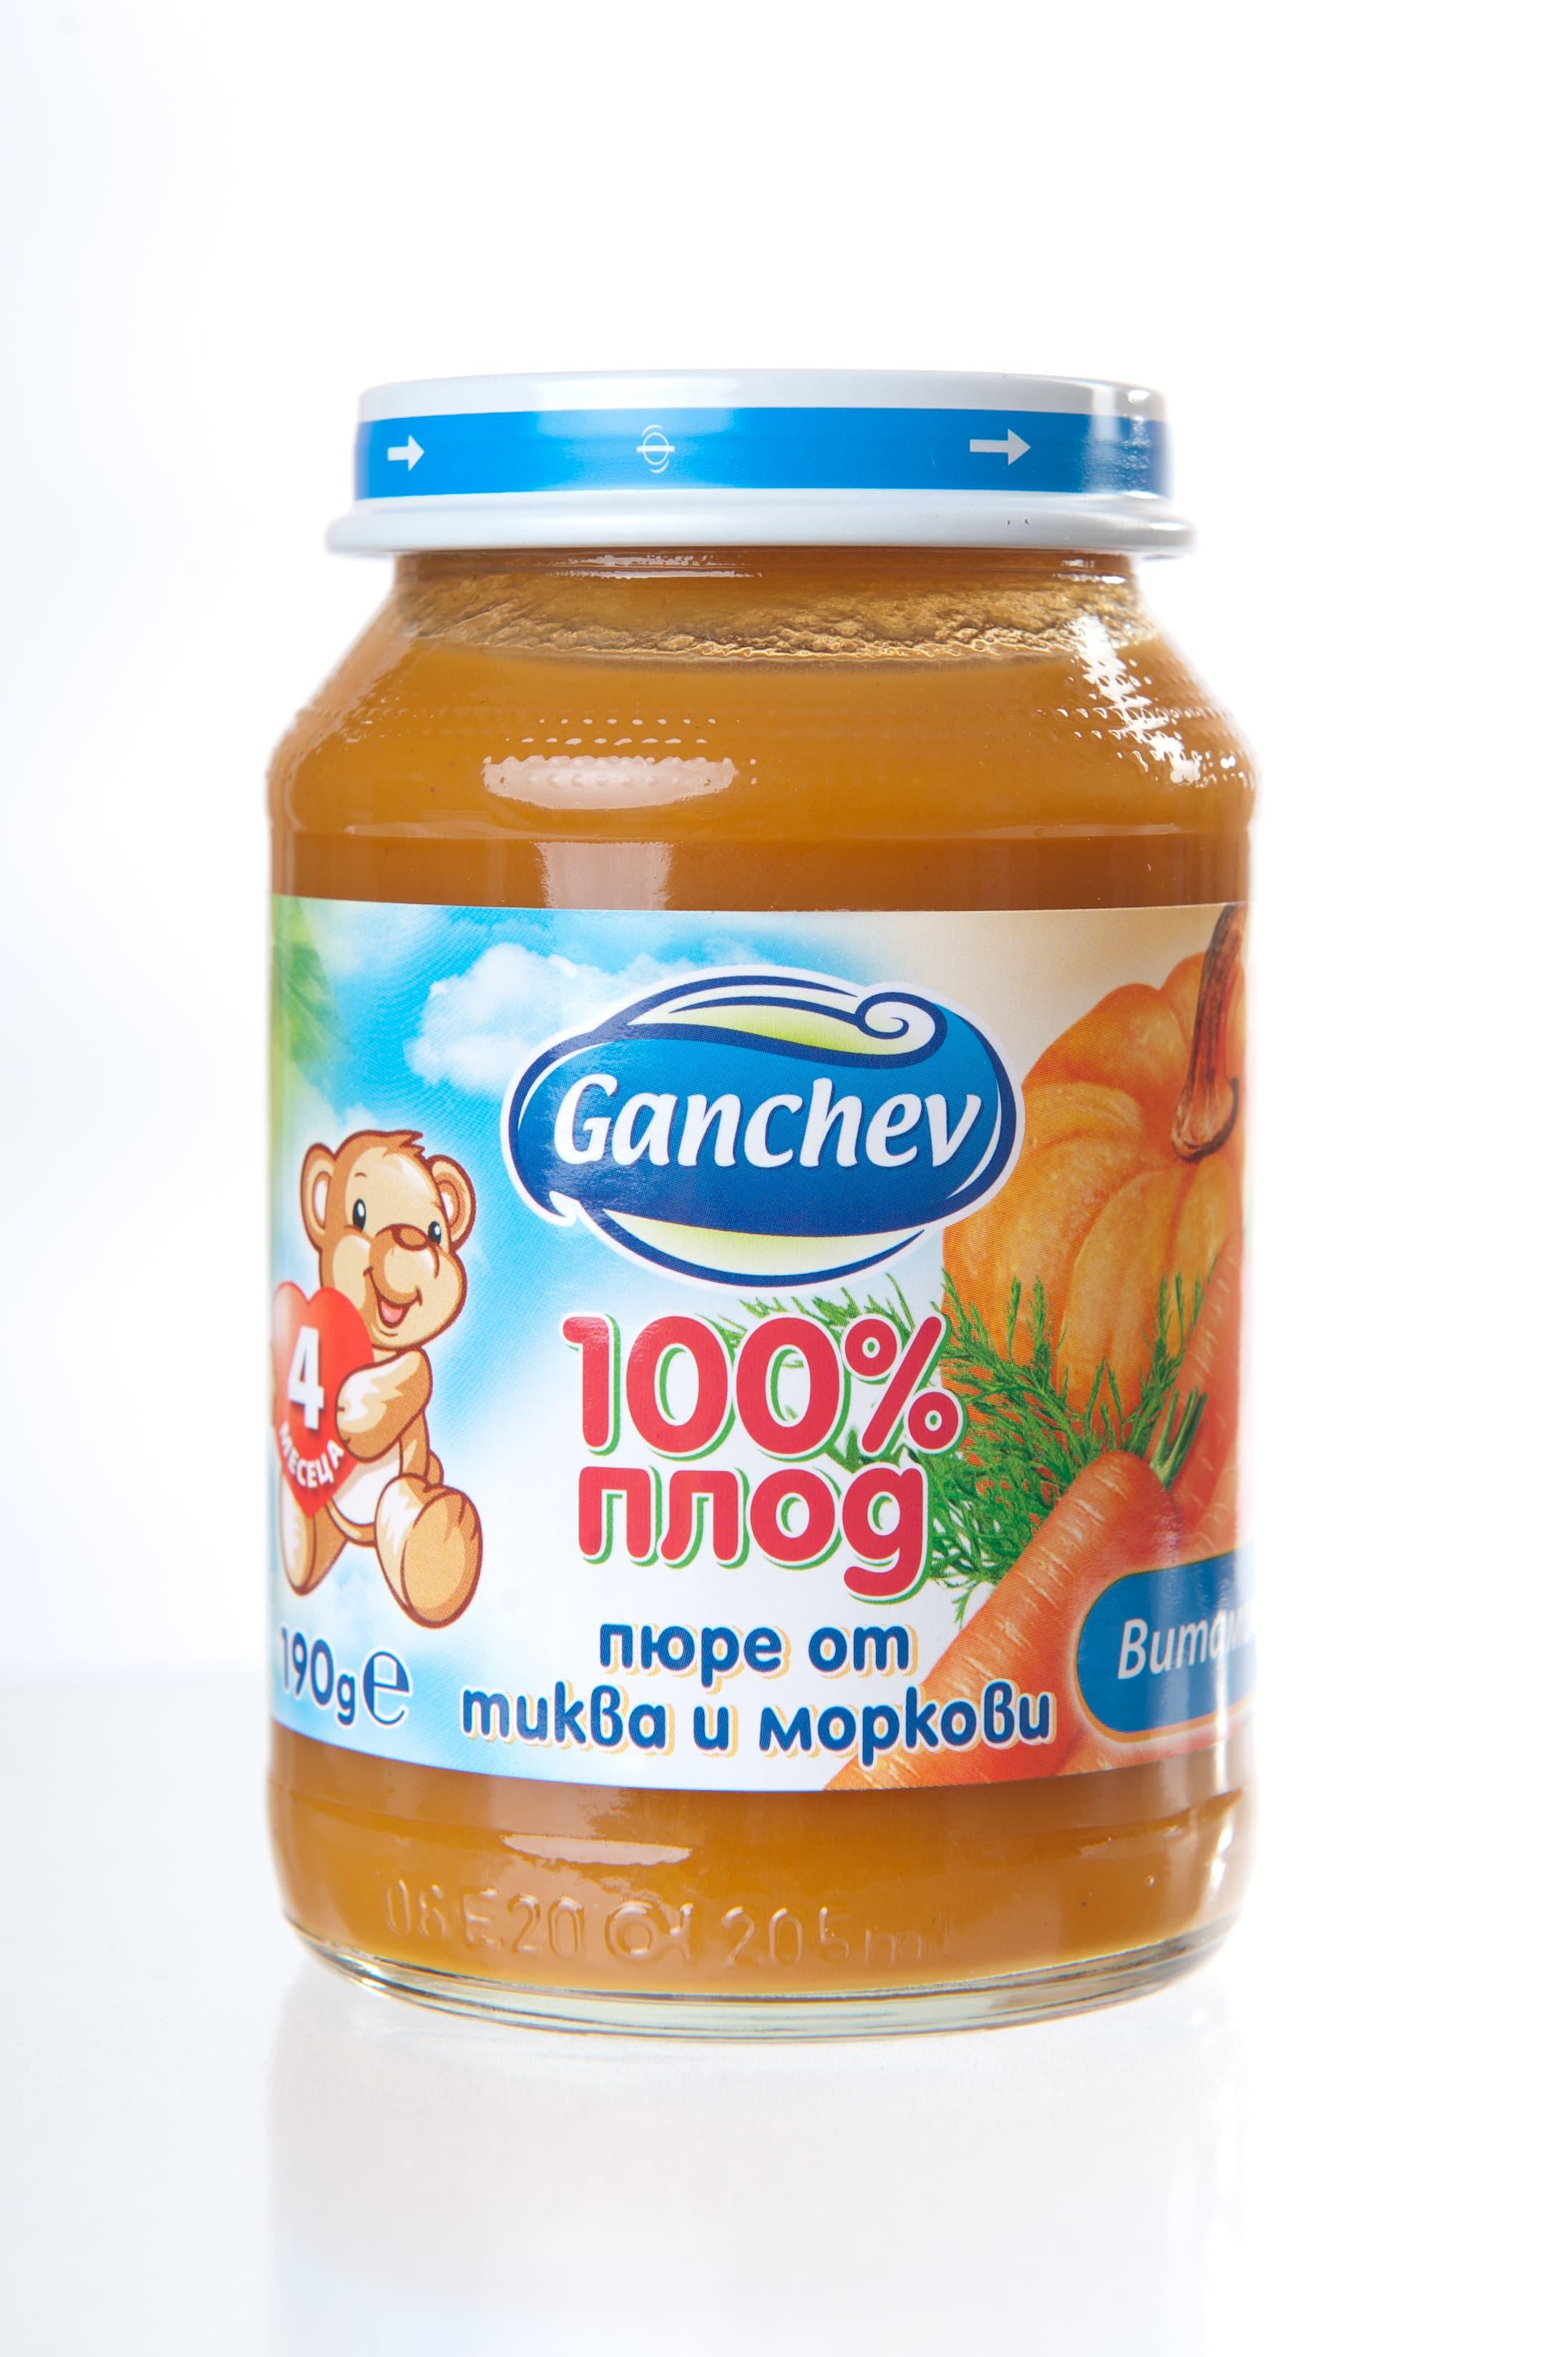 Ganchev-пюре тиква и моркови 4м+ 190гр